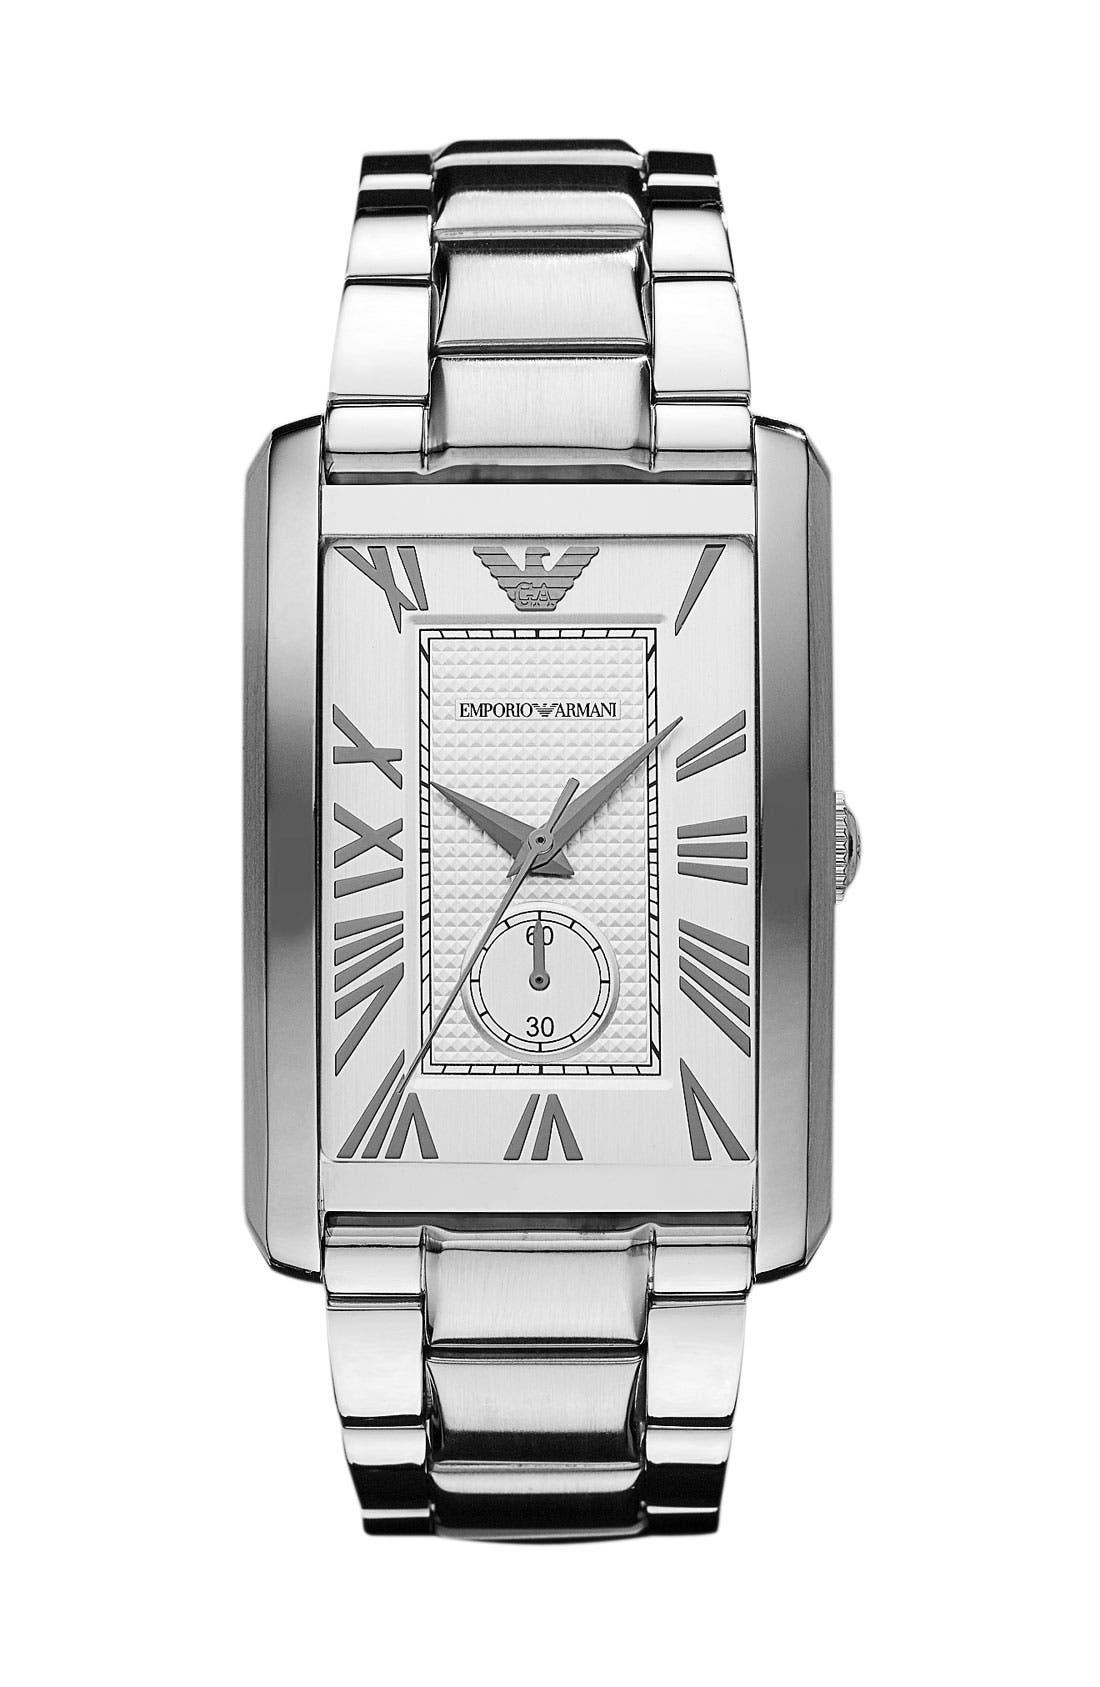 Main Image - Emporio Armani 'Classic - Large' Rectangular Dial Watch, 31mm